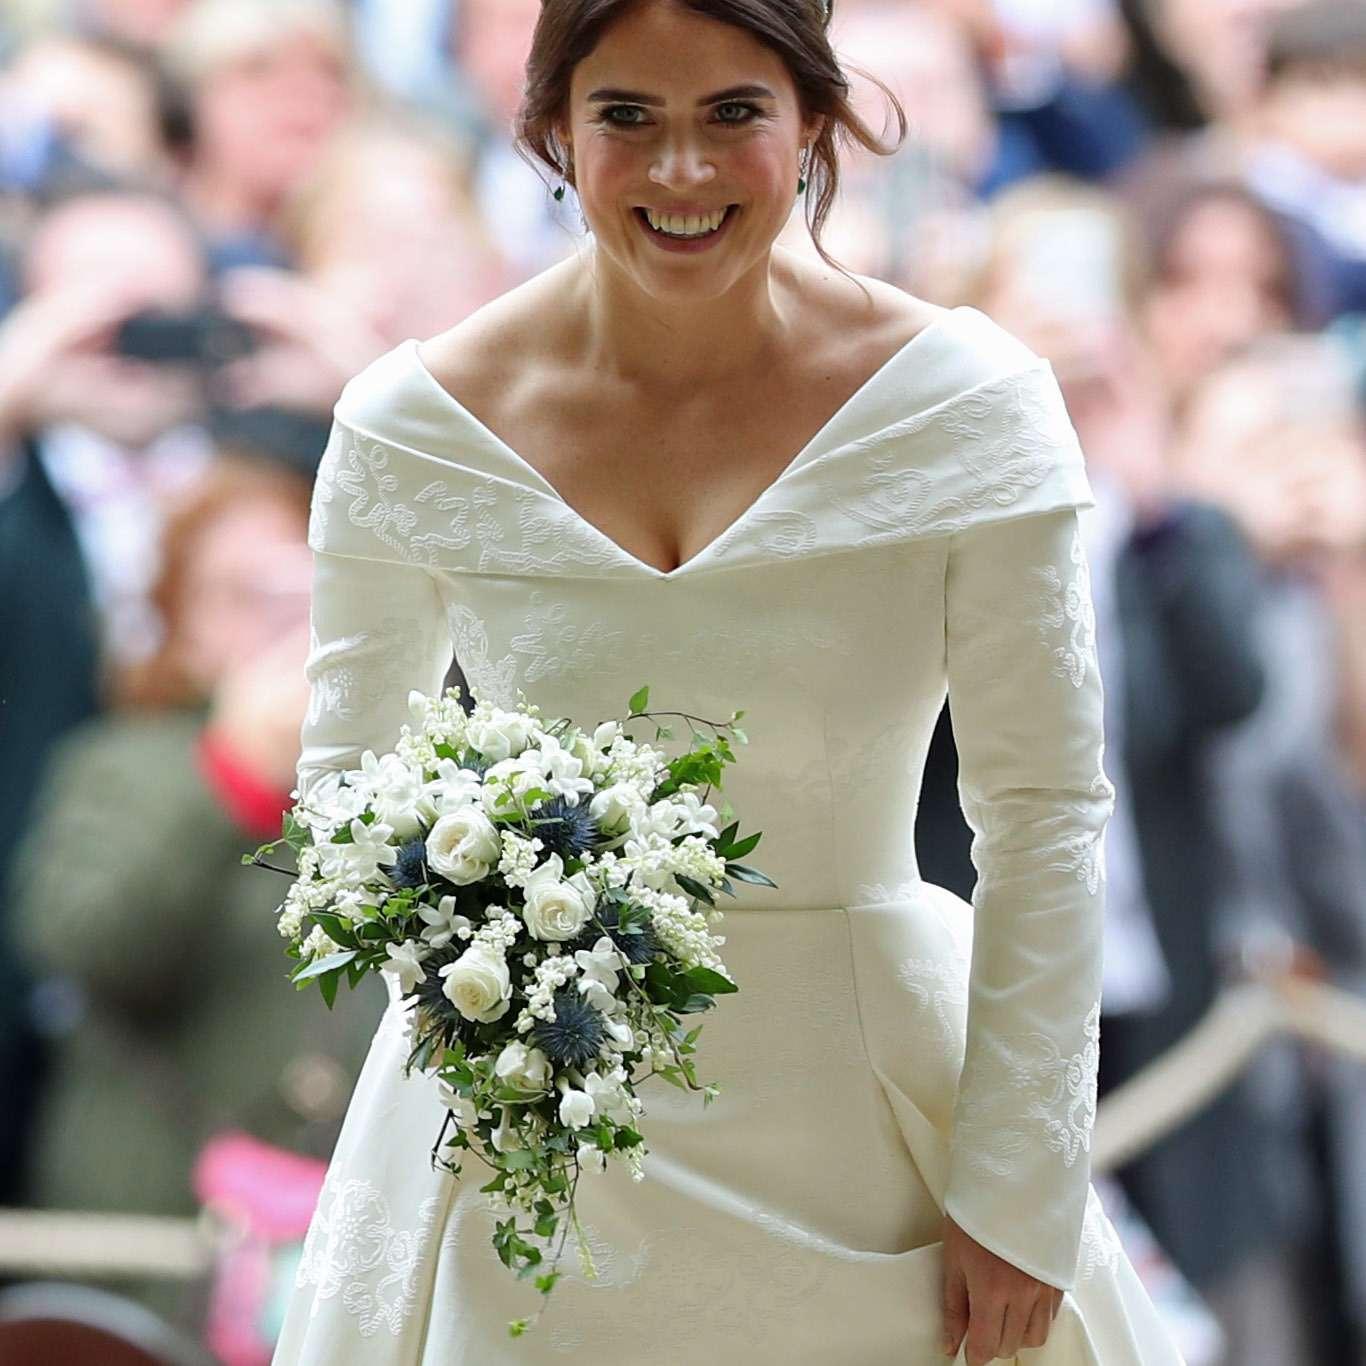 Princess Eugenie's Dipped Back Wedding Dress